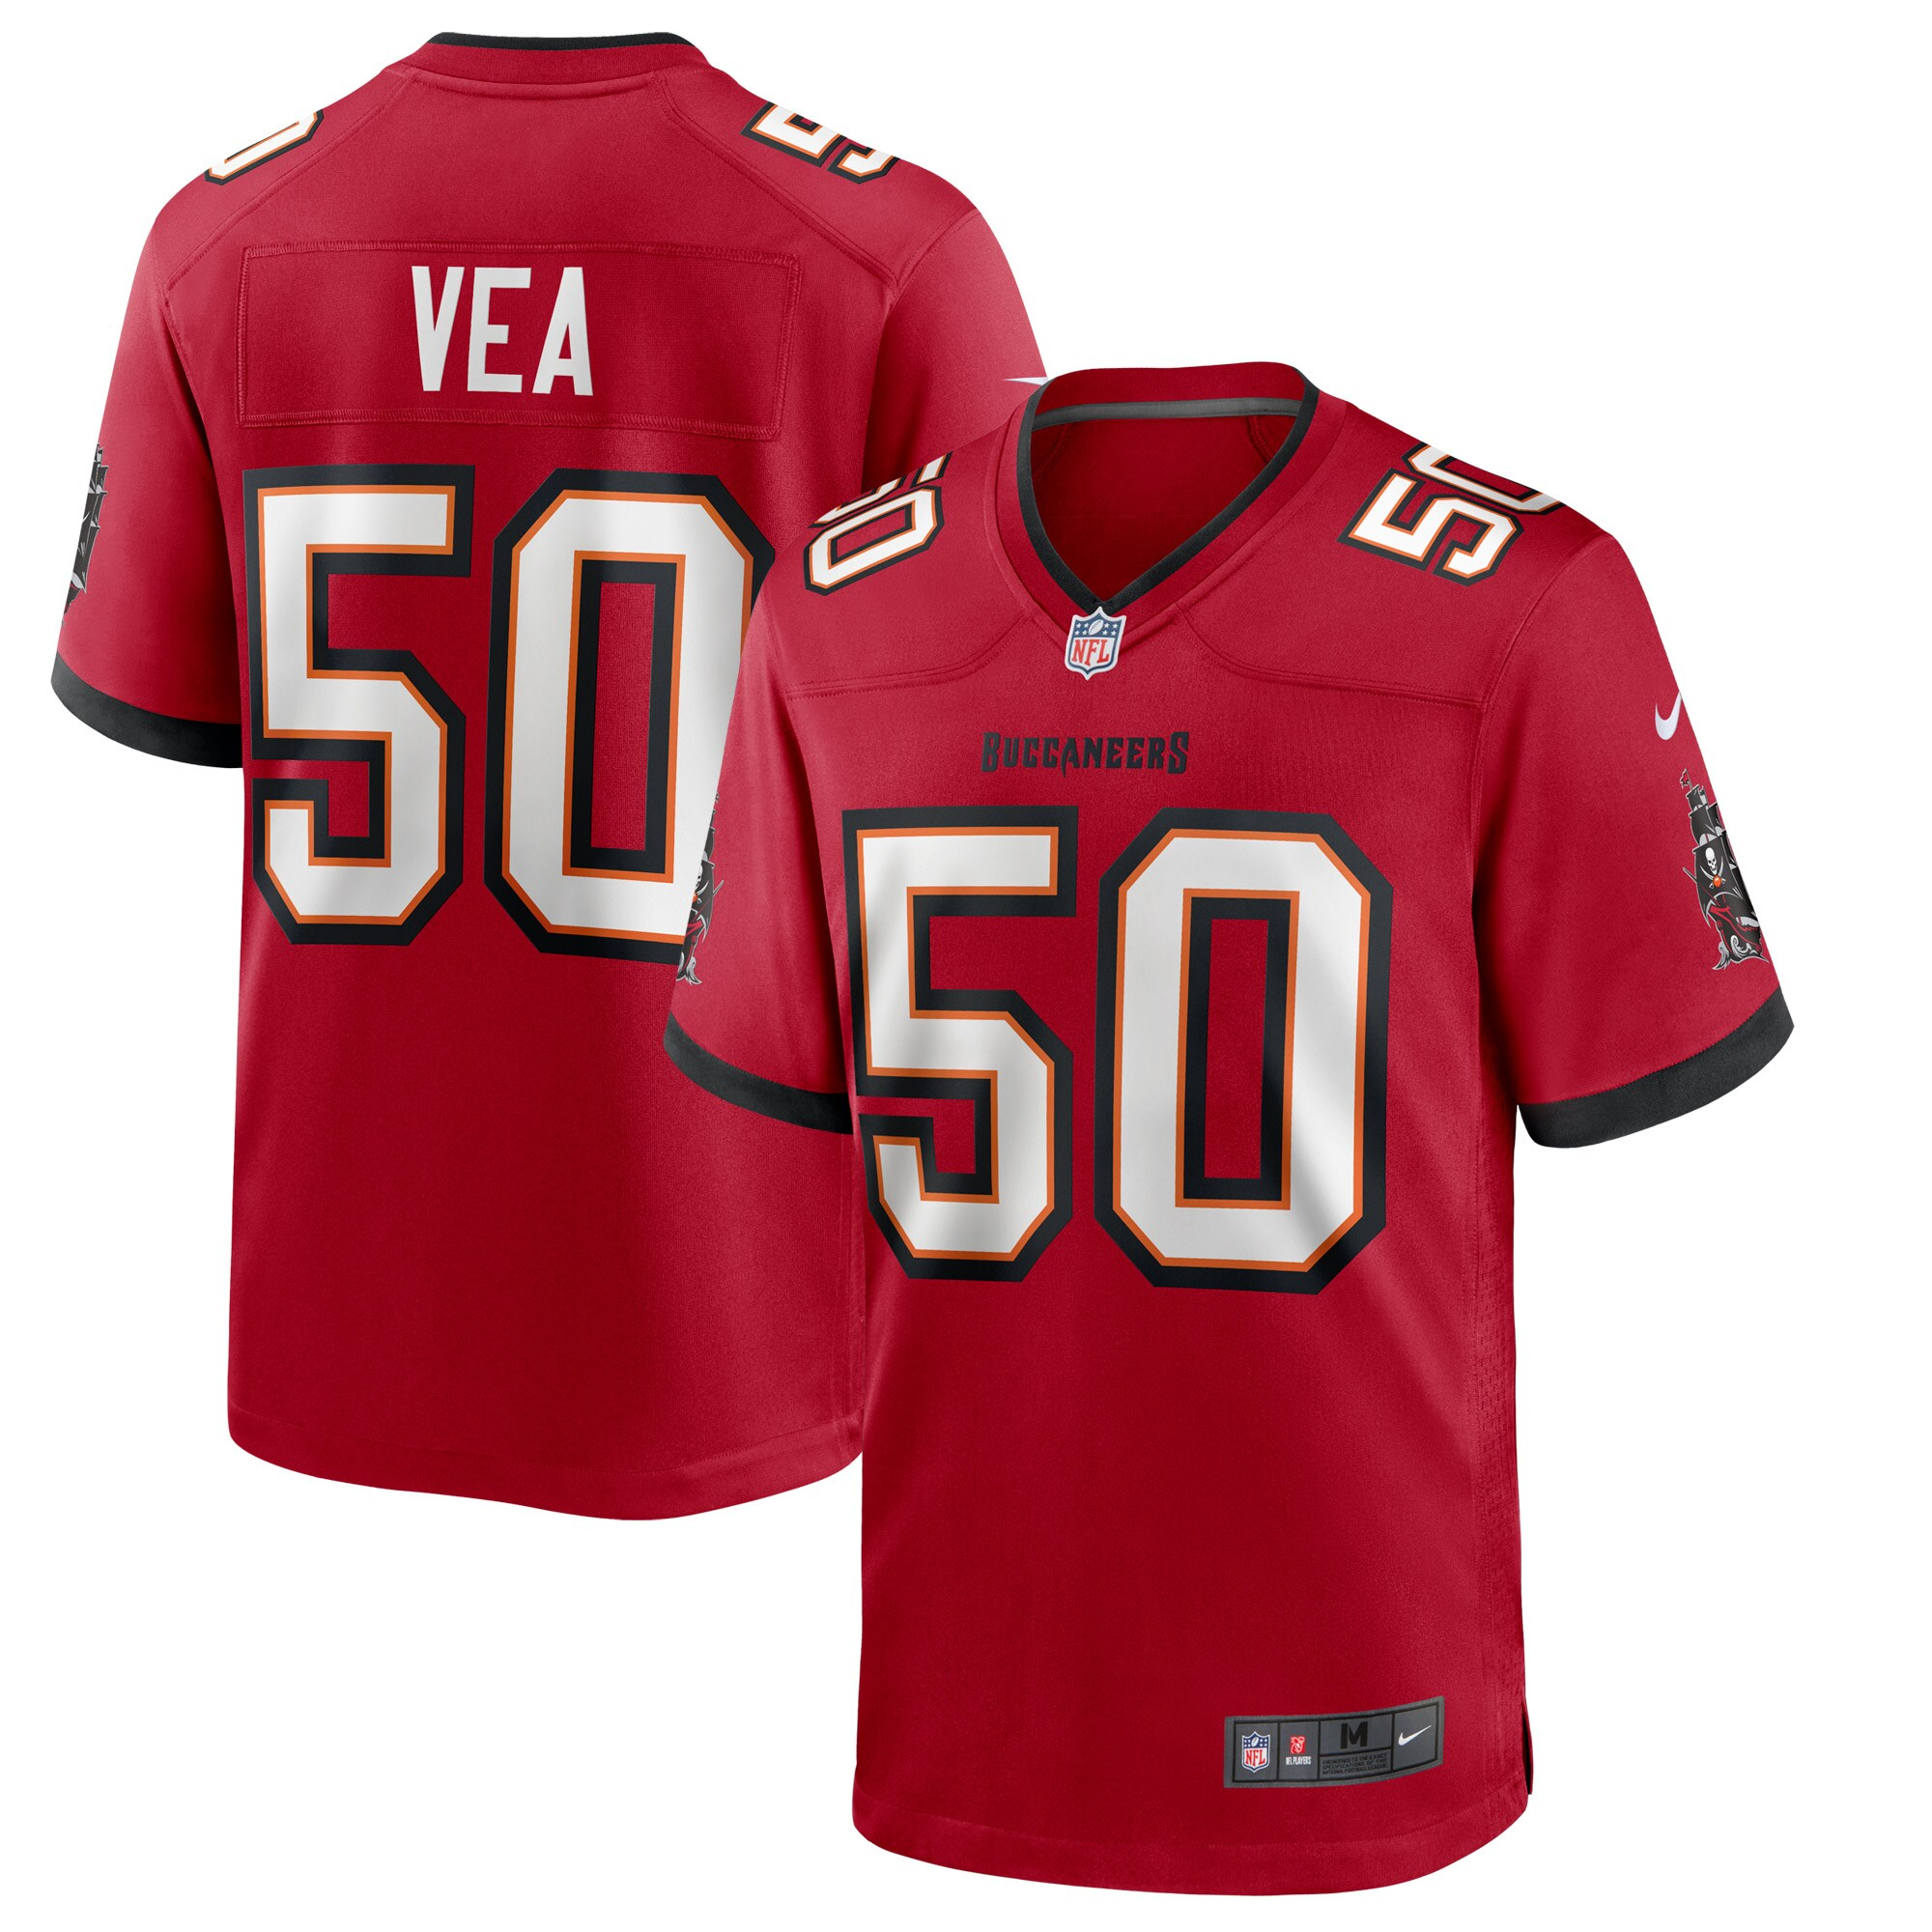 Vita Vea Tampa Bay Buccaneers Nike Game Jersey - Red